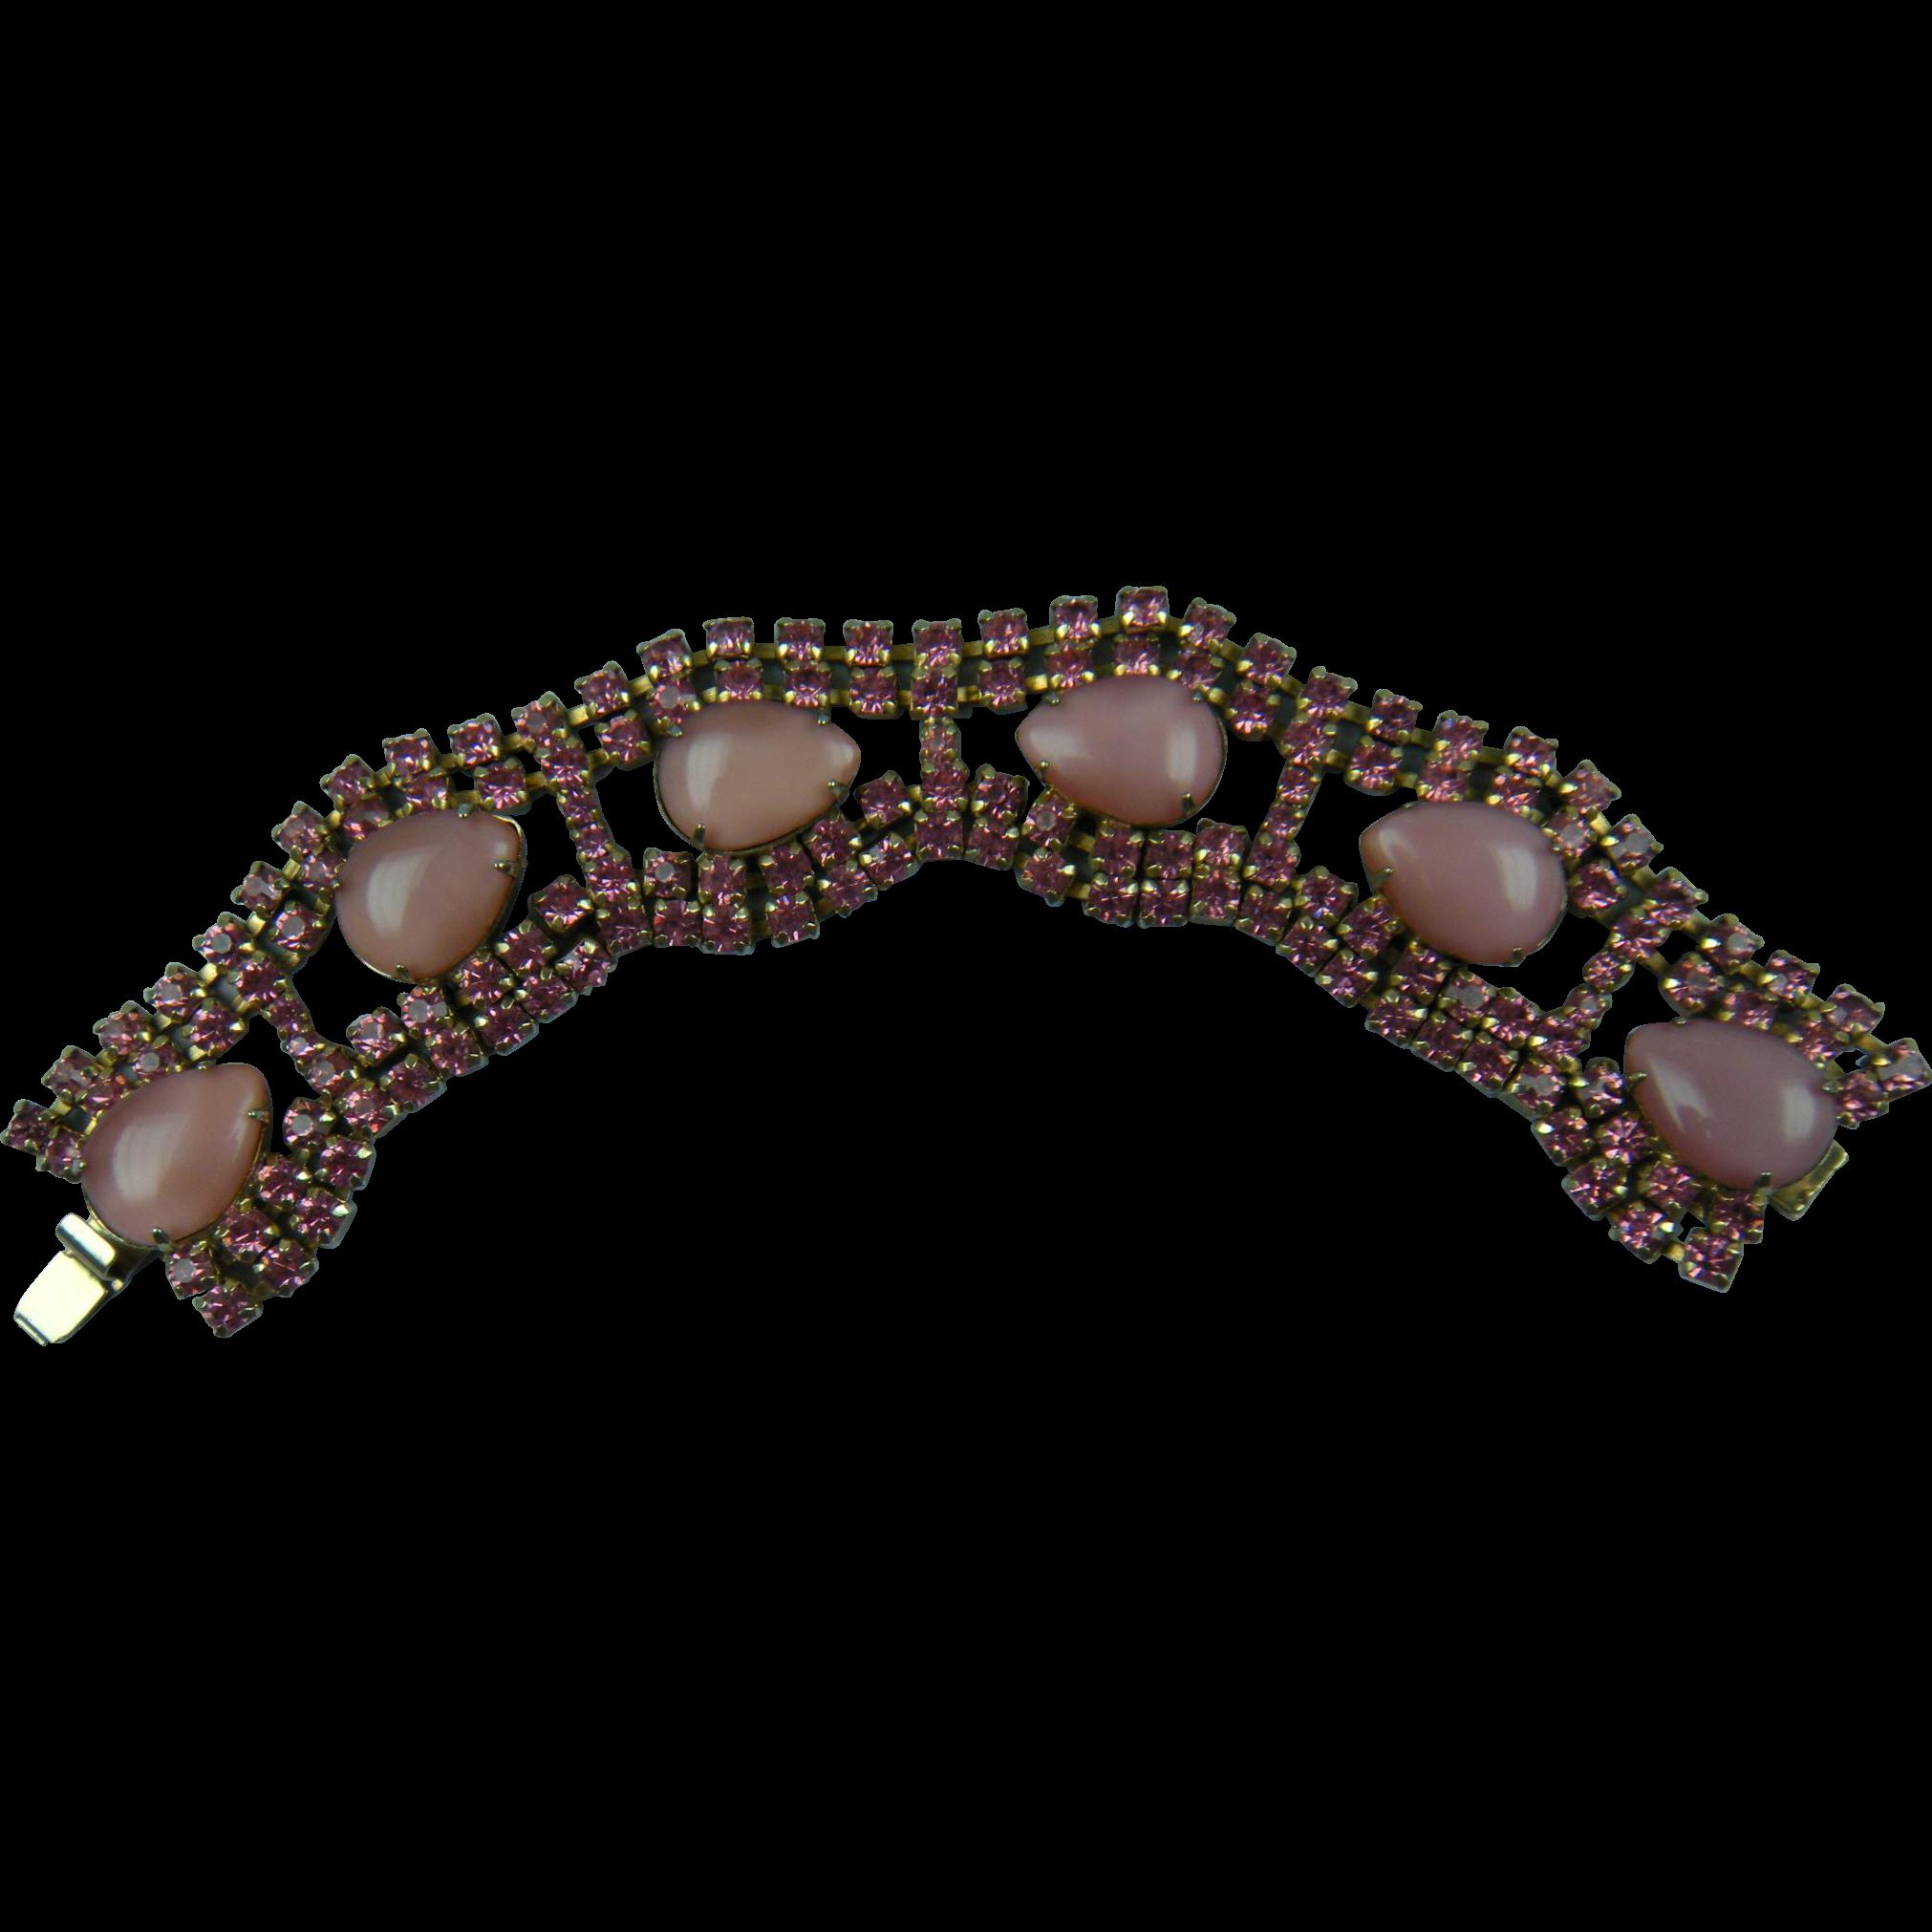 Luscious Pink Rhinestone Bracelet